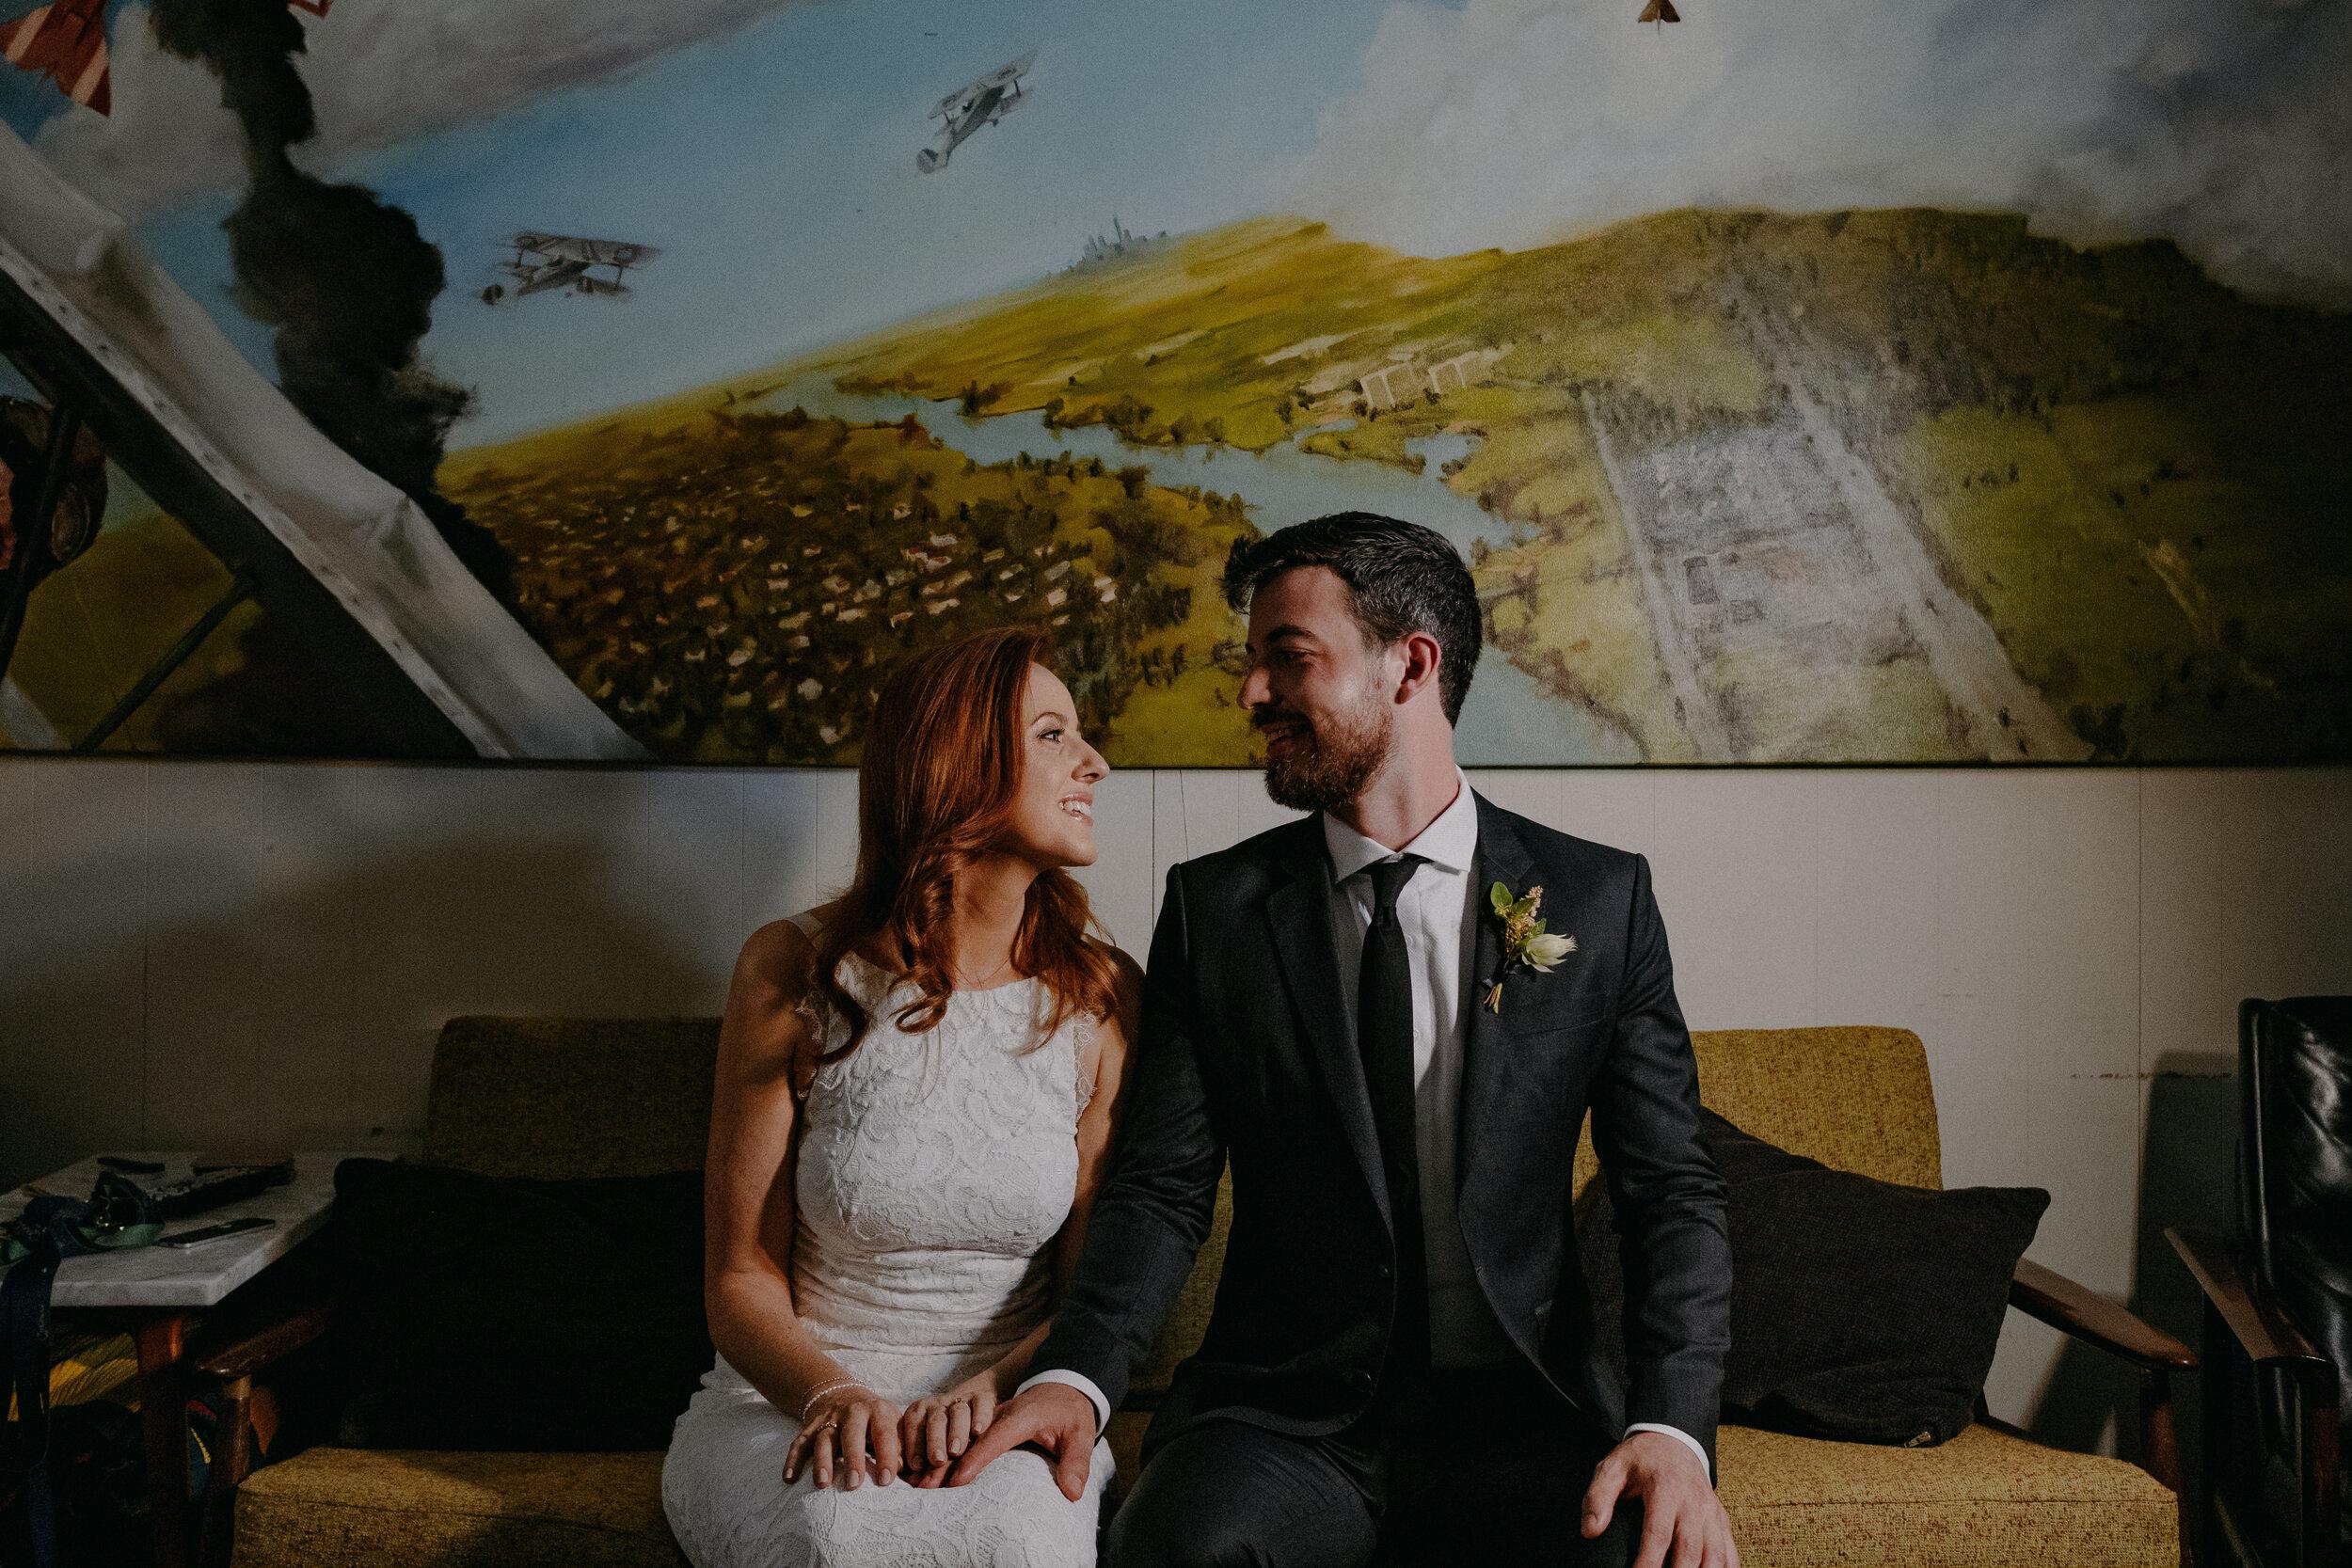 Aurora_Brooklyn_Wedding_Photographer_Chellise_Michael_Photography-124.jpg